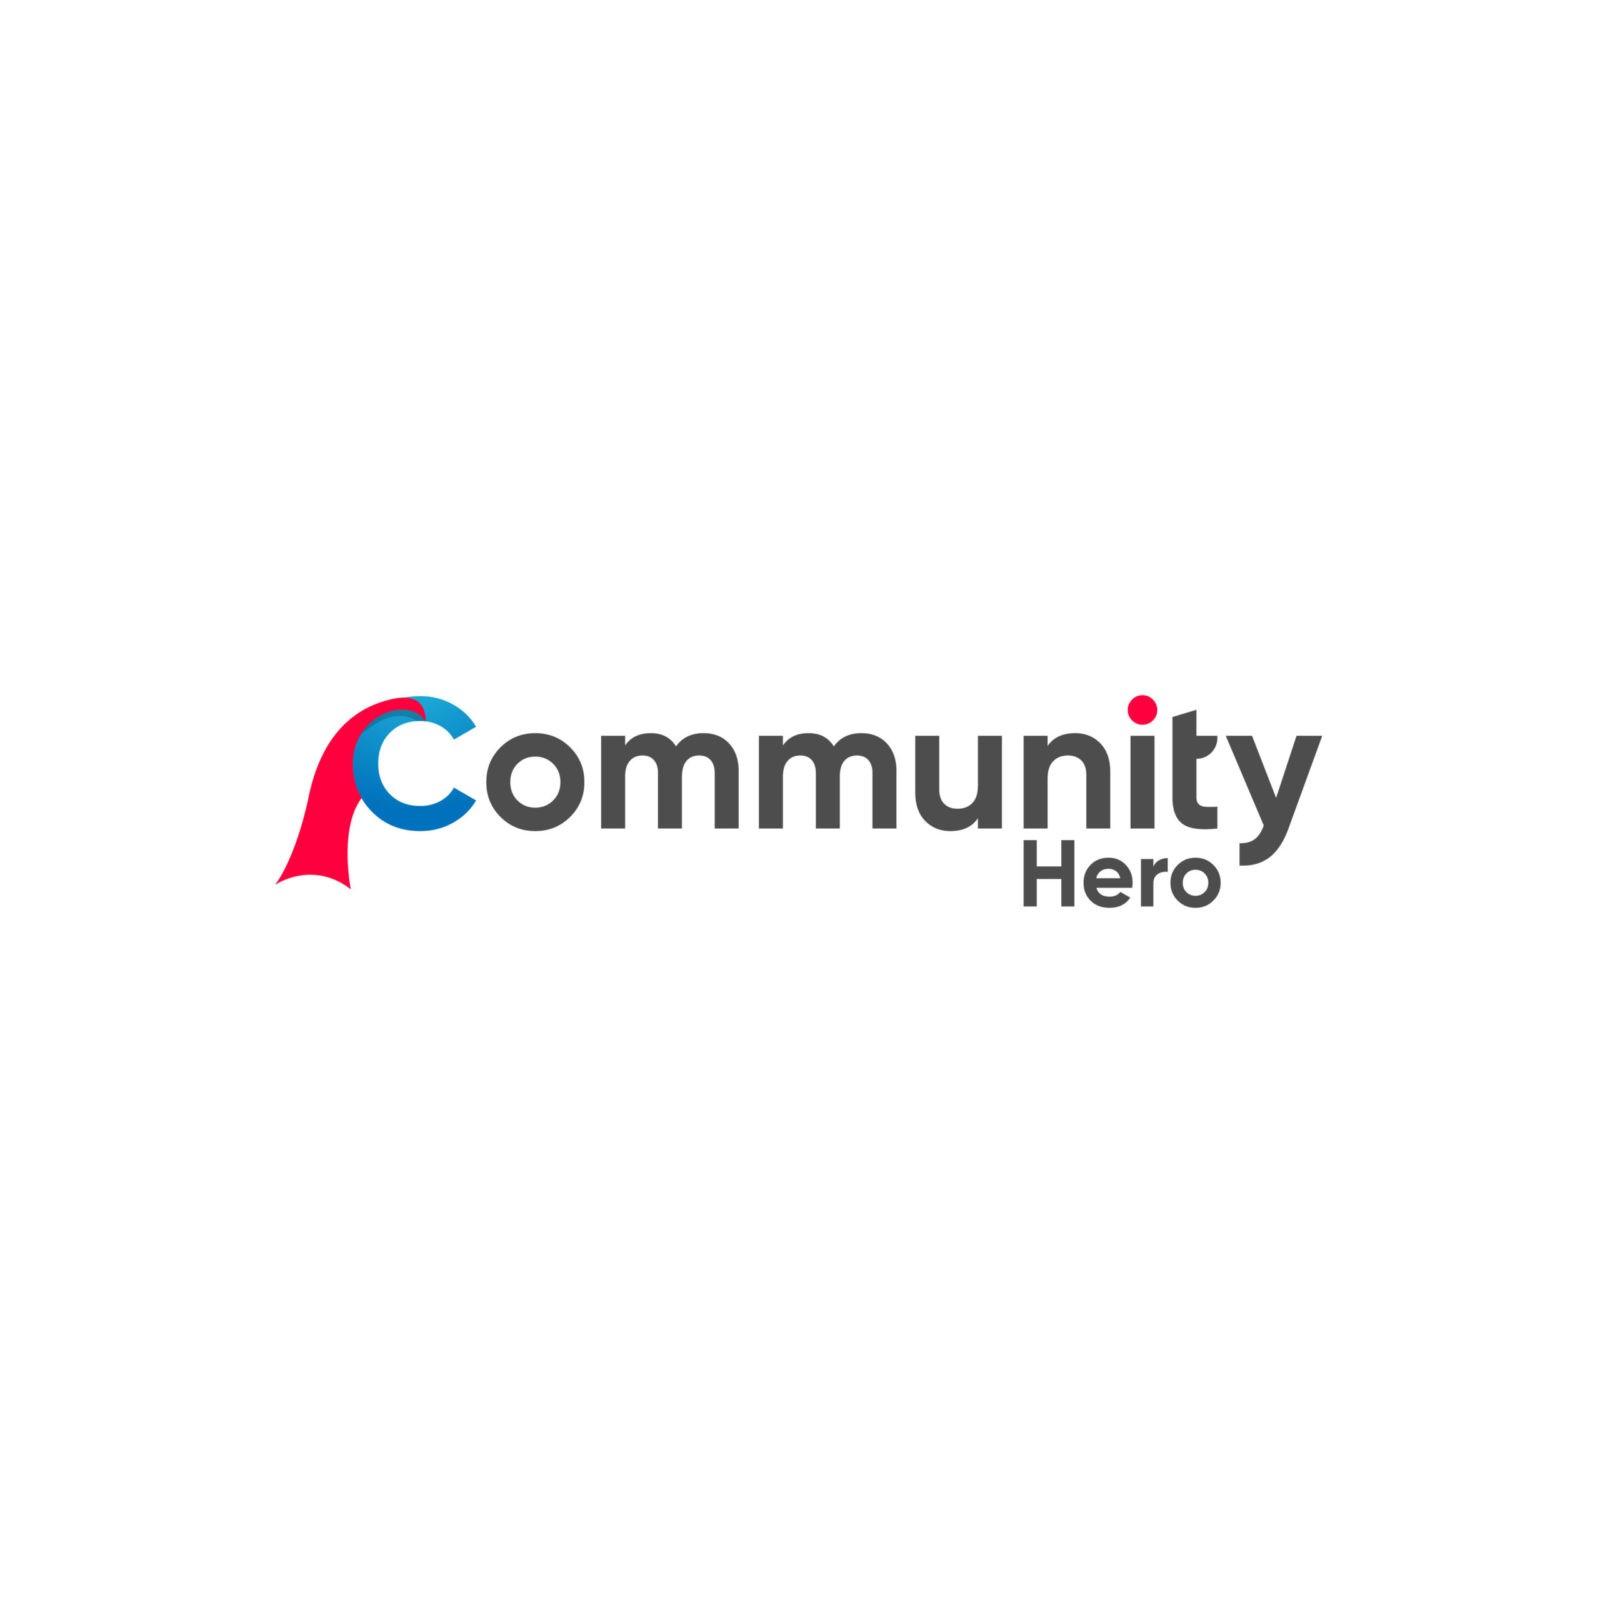 Community Hero Action Group